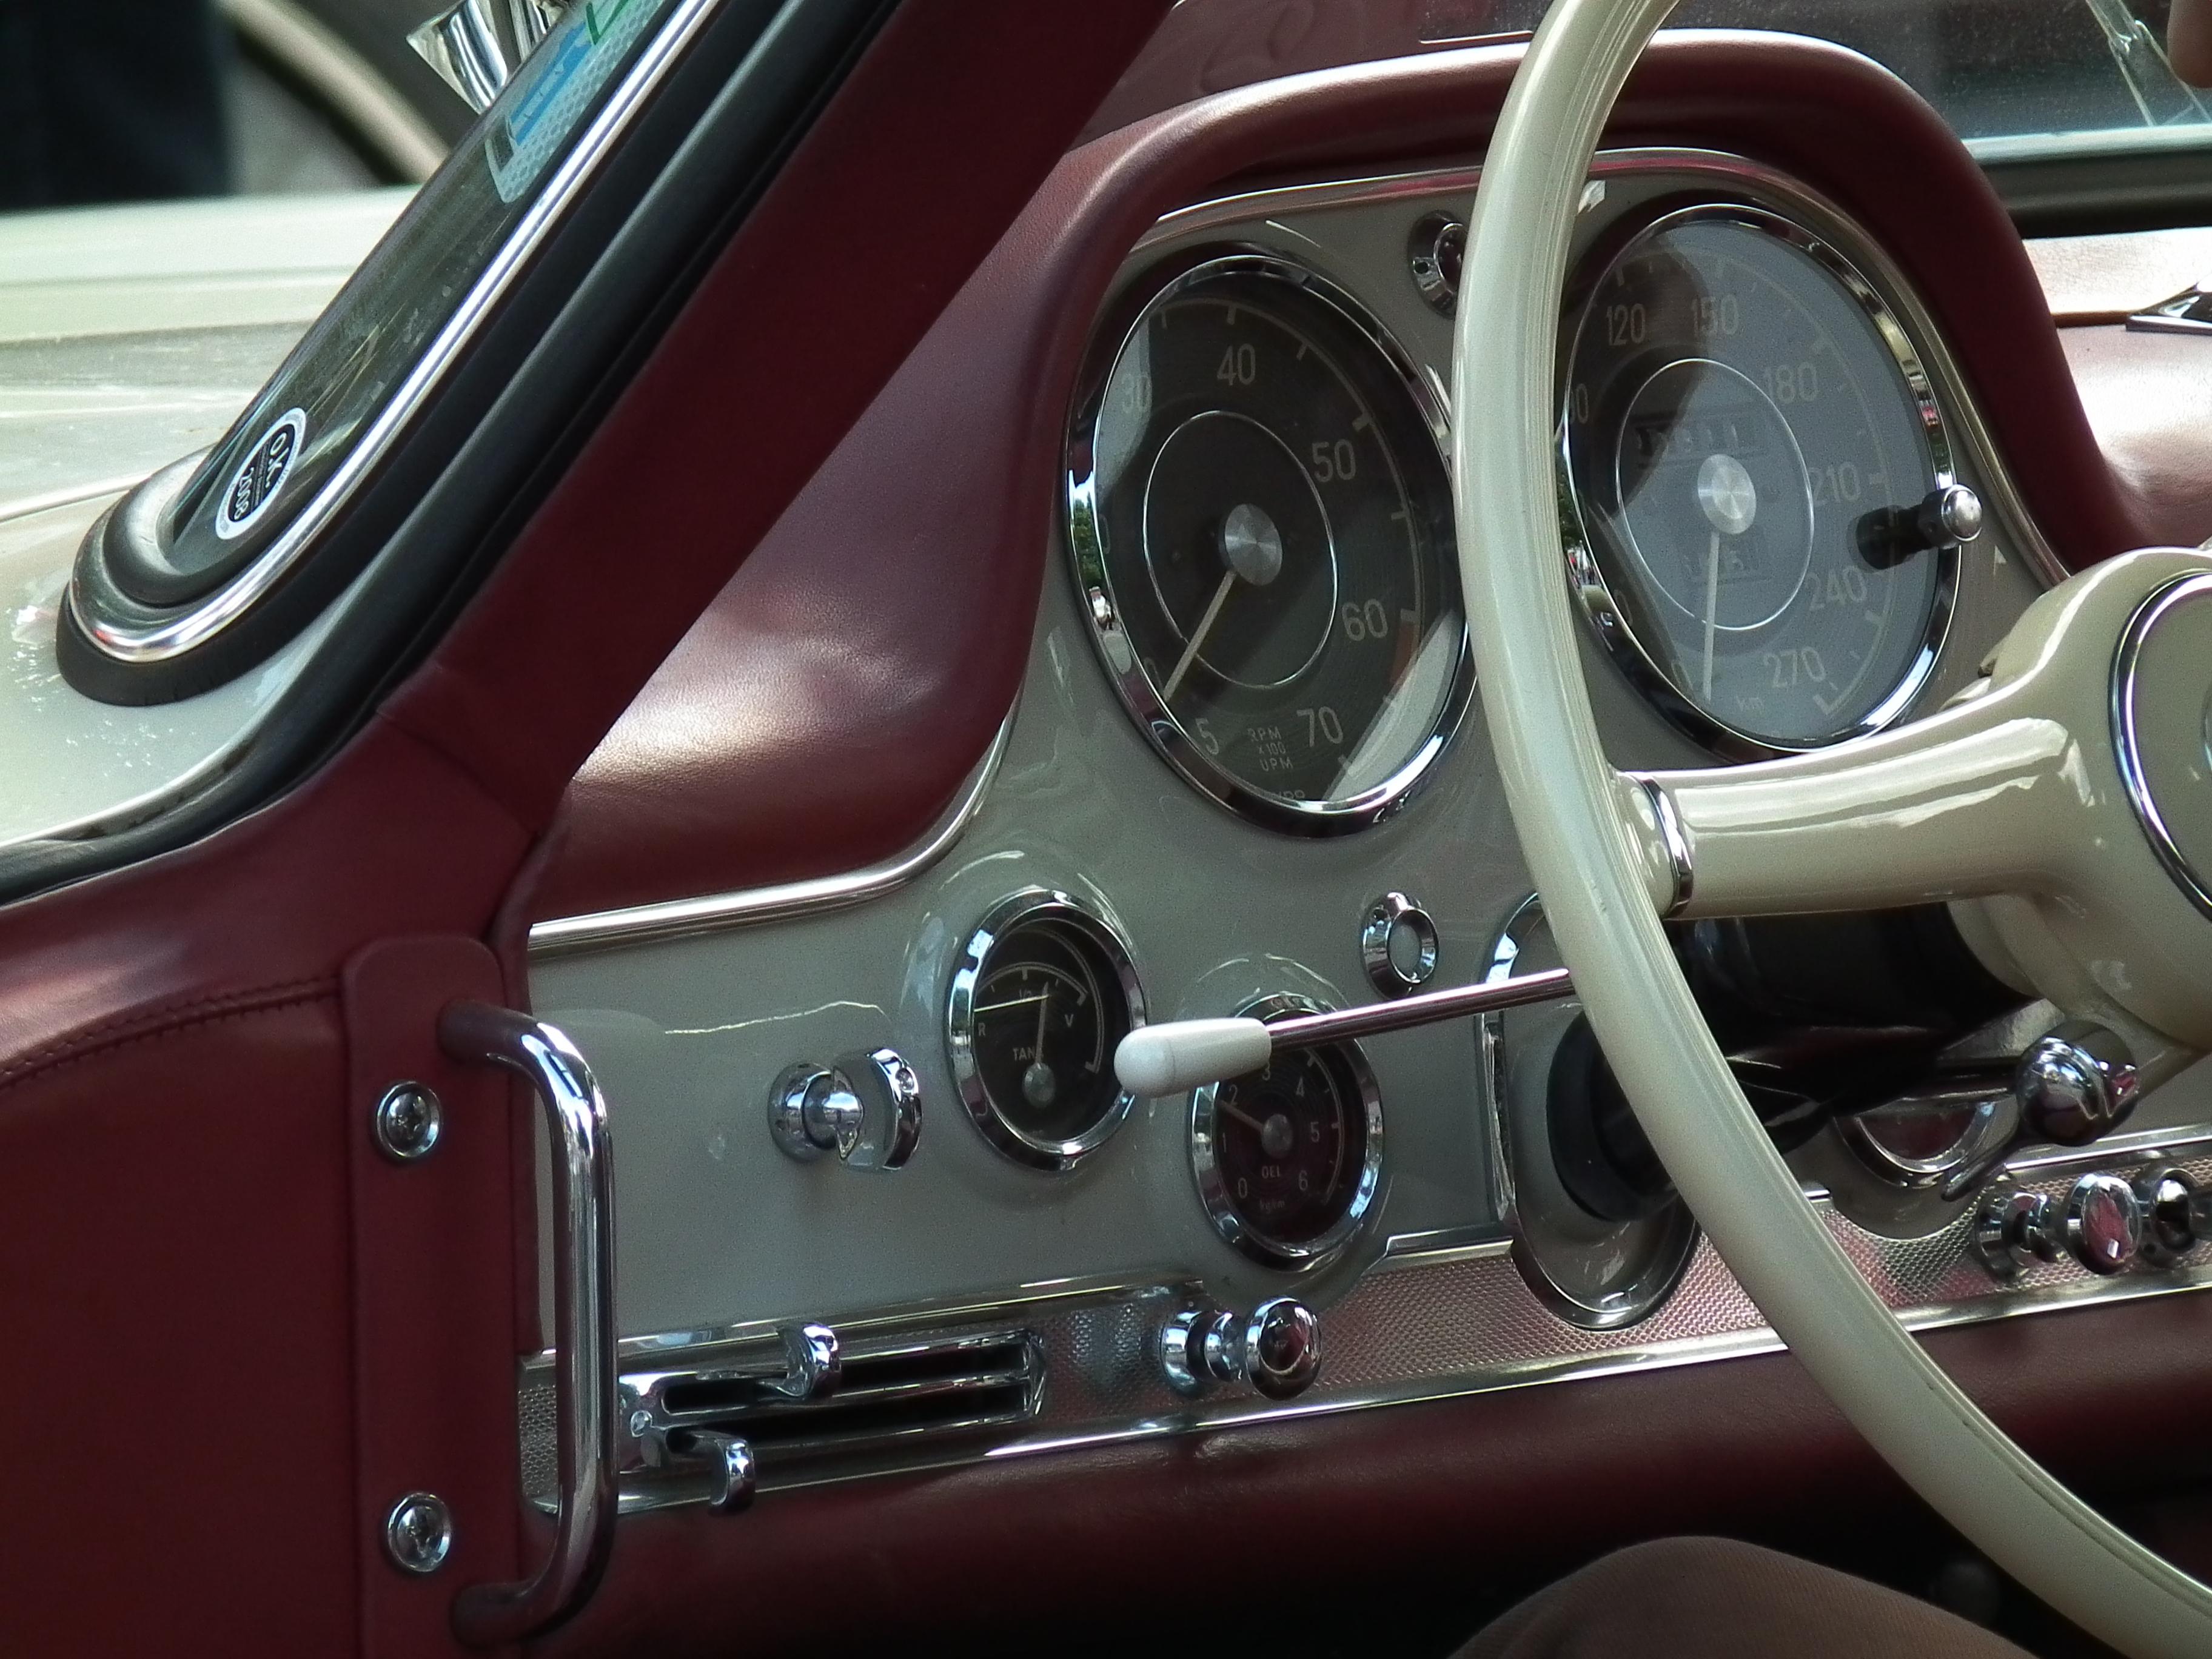 Armaturenbrett mercedes  File:Armaturenbrett Mercedes 300 SL.JPG - Wikimedia Commons